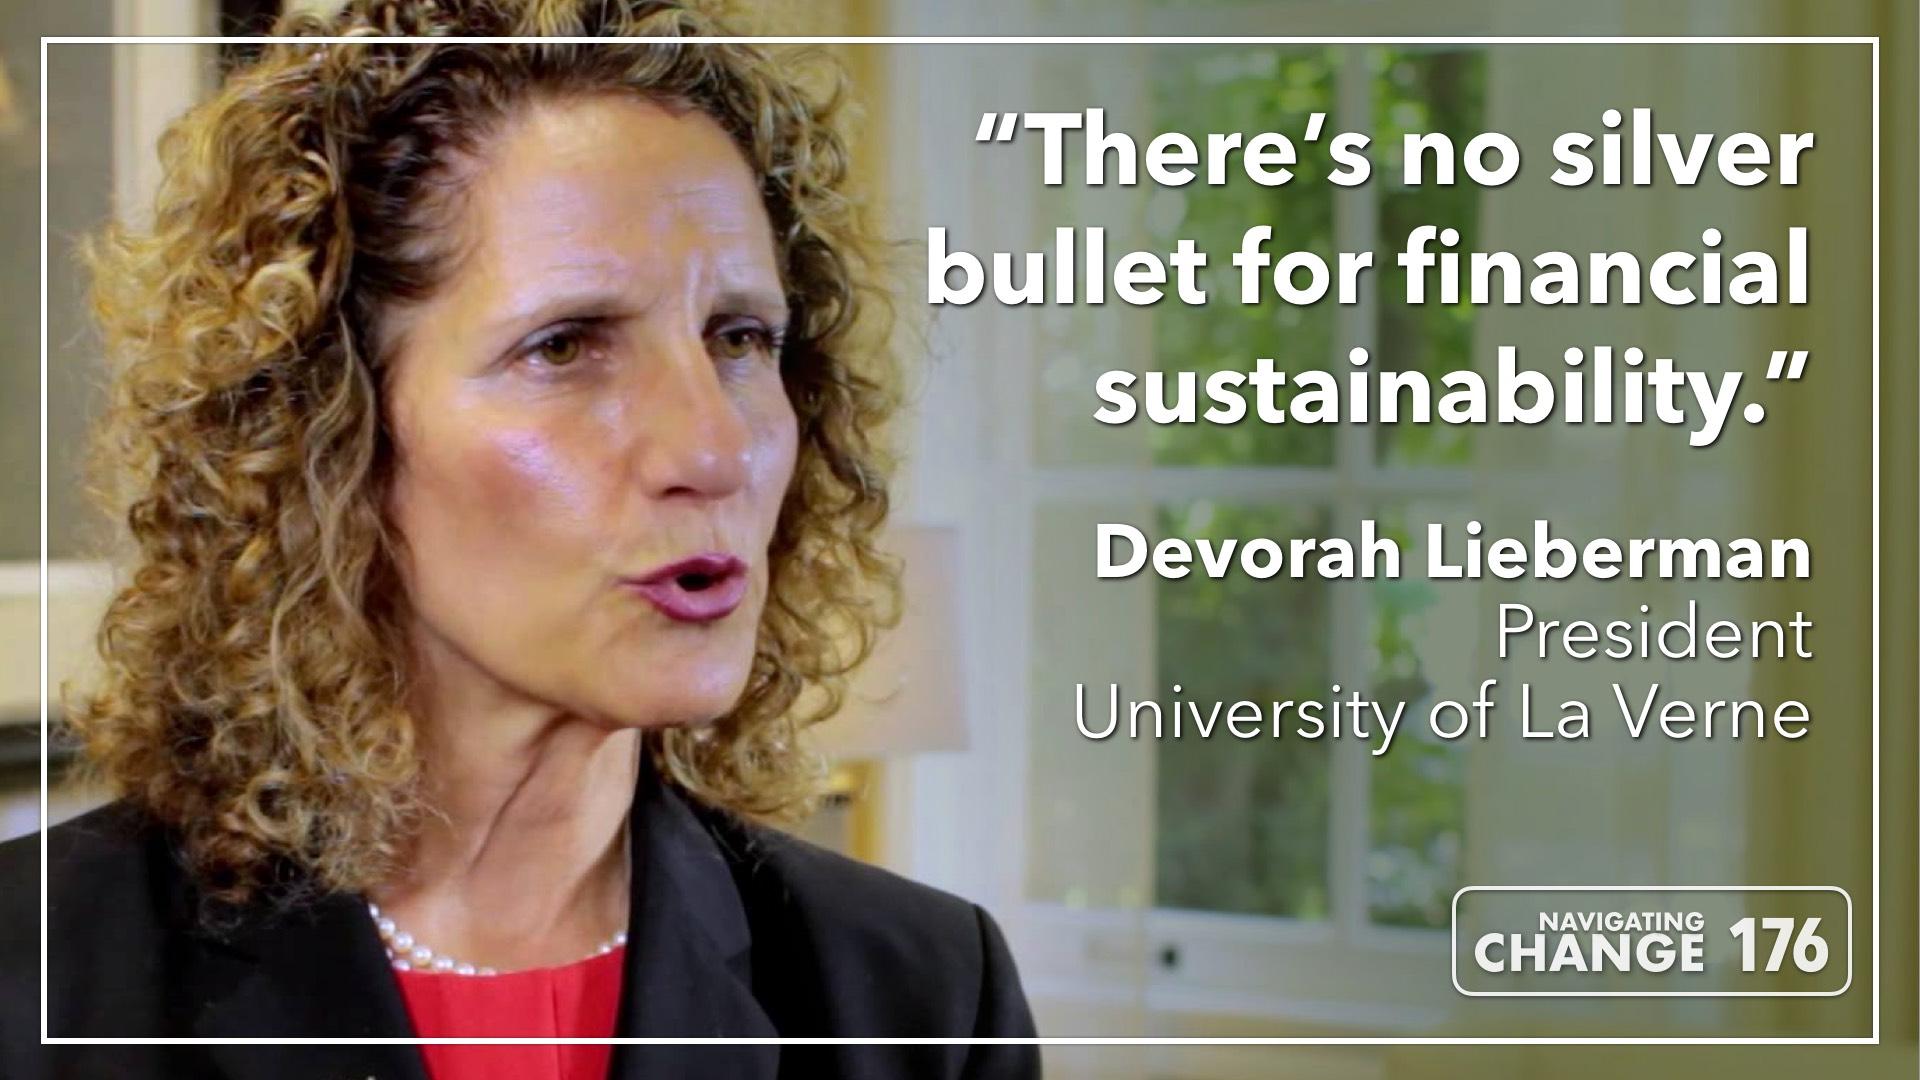 Listen to Devorah Lieberman on The Navigating Change Podcast